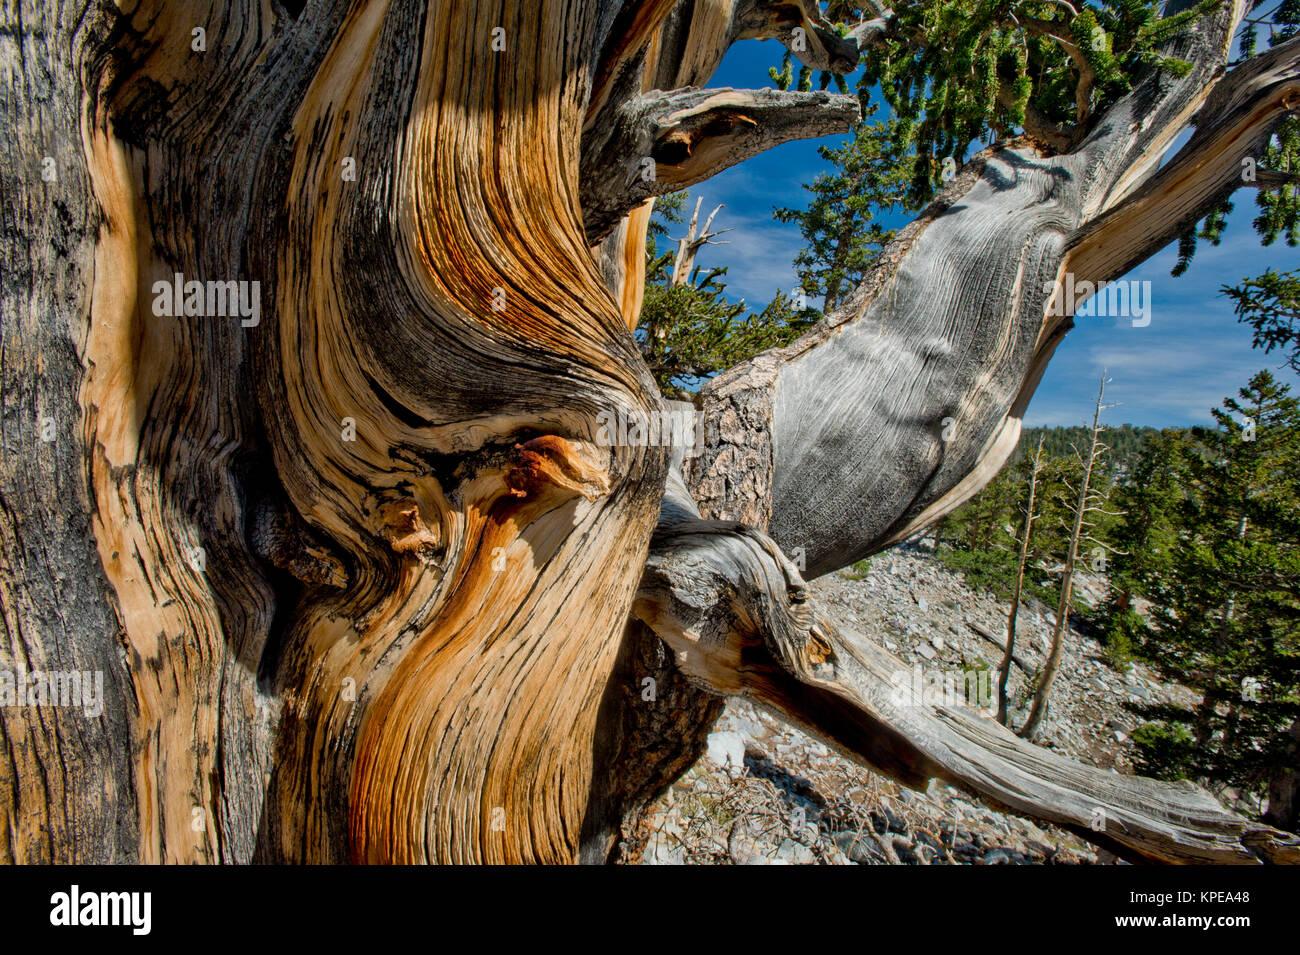 Bristlecone Pine (Pinus longaeva) im Great Basin National Park, Nevada. Älteste bekannte nicht klonalen Organismus Stockbild